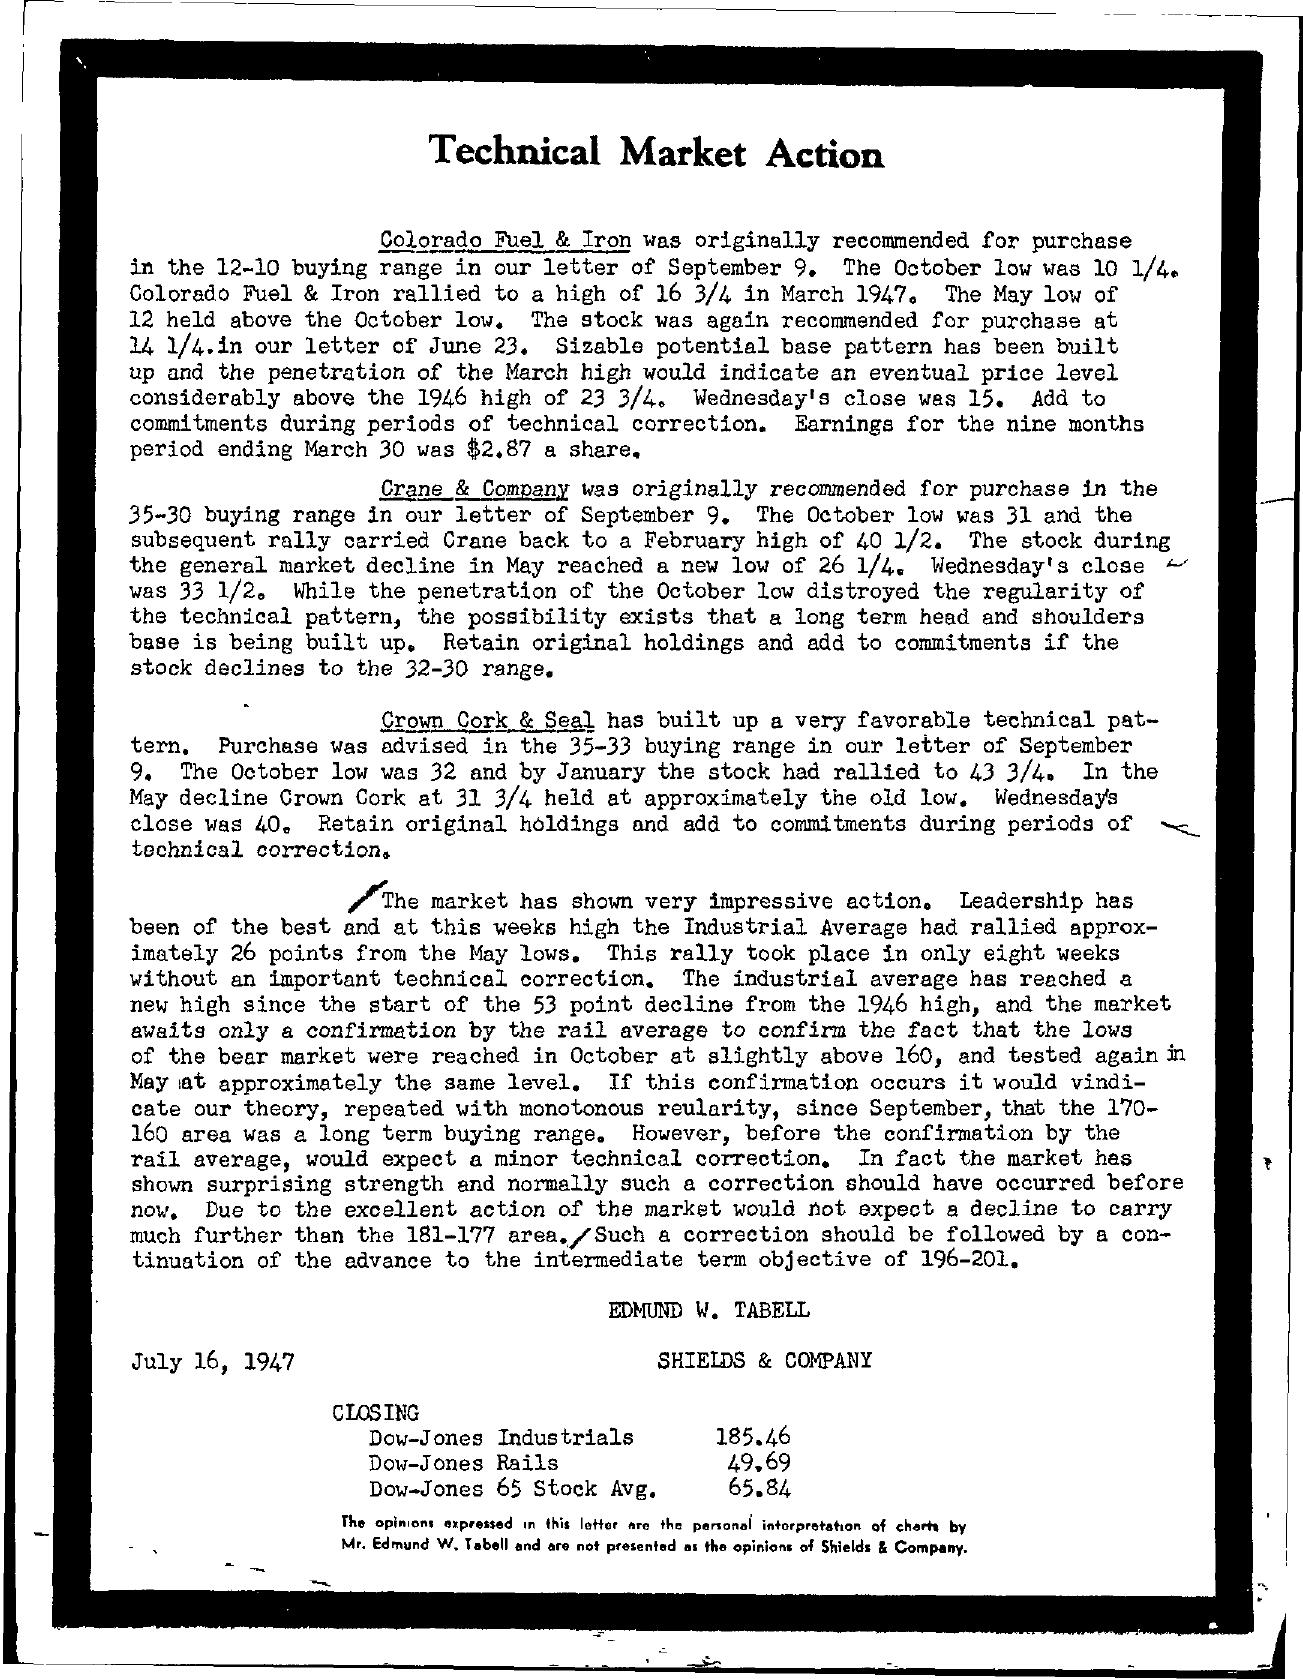 Tabell's Market Letter - July 16, 1947